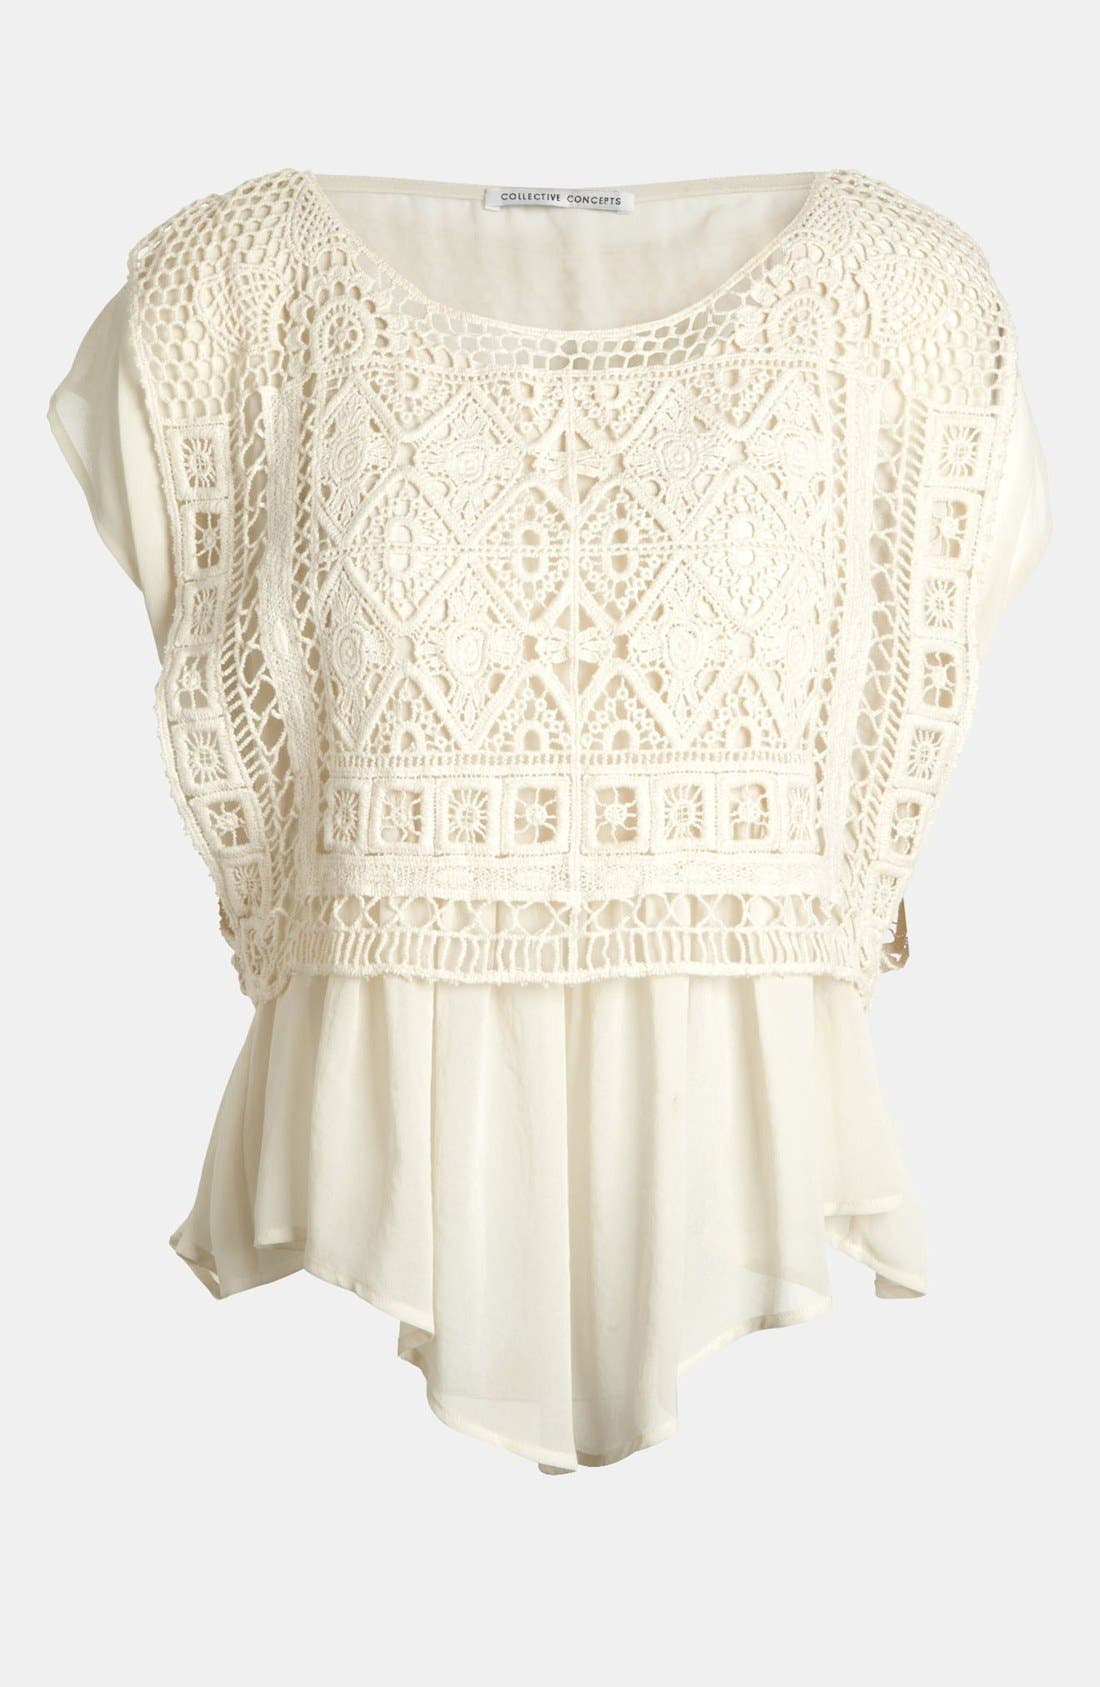 Main Image - Creative Commune Crochet Top